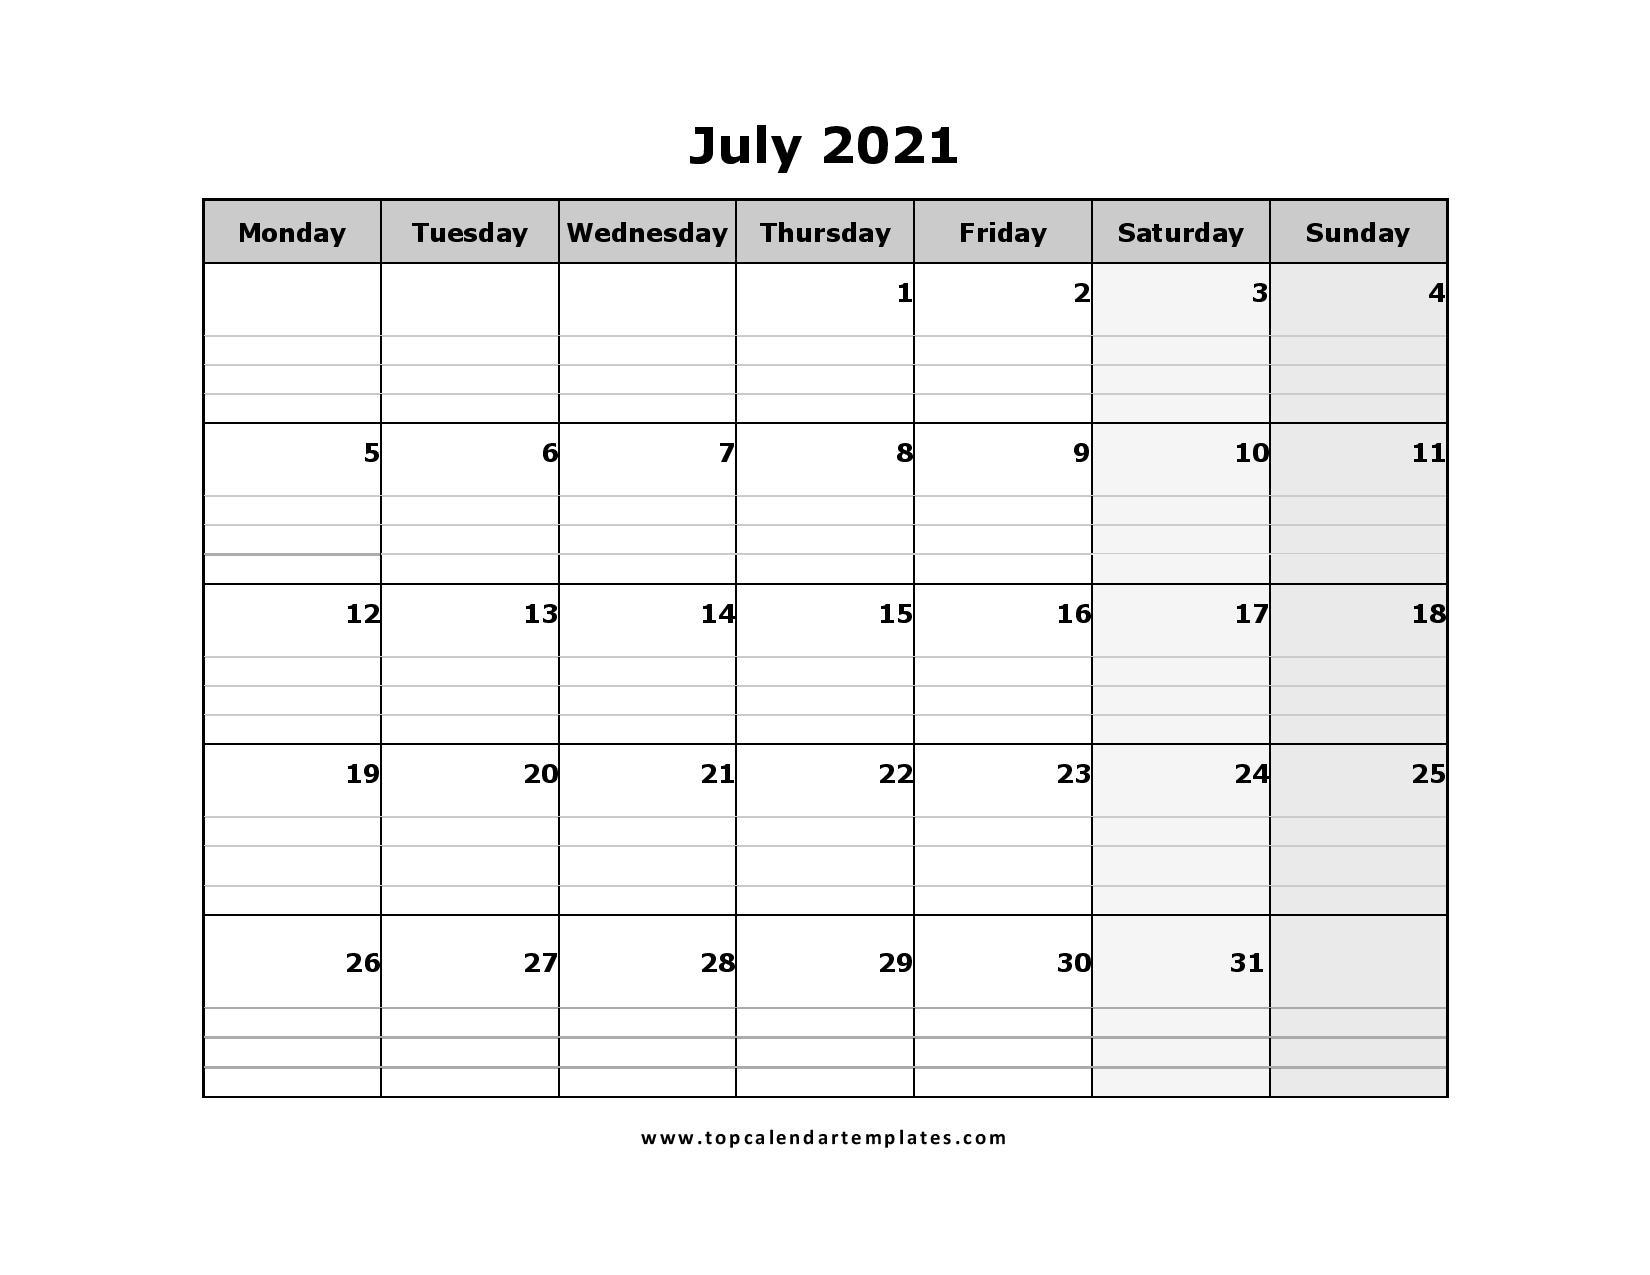 Printable July 2021 Calendar Template - Pdf, Word, Excel